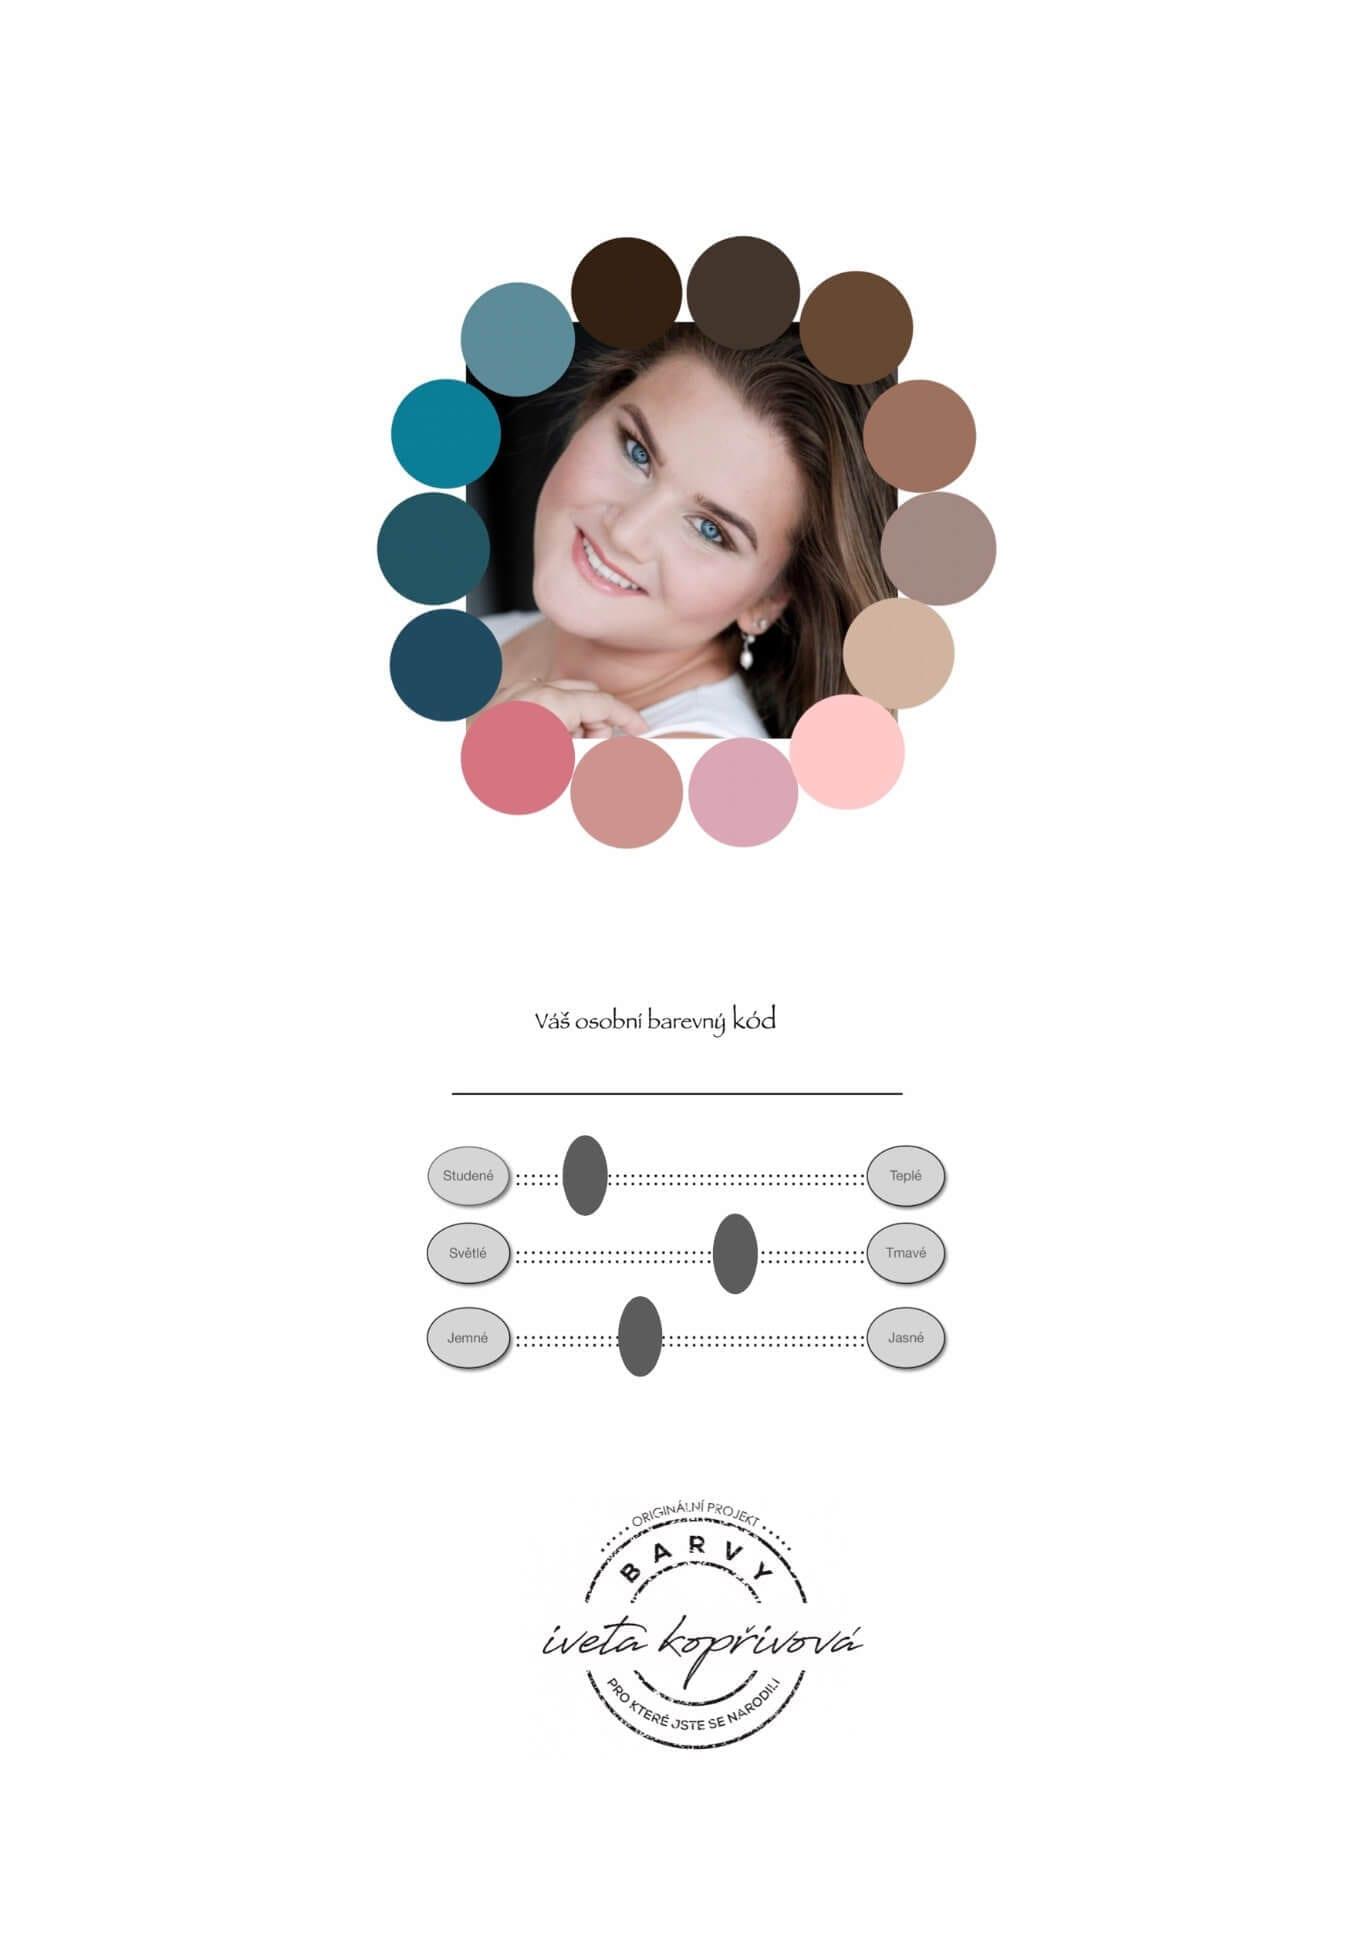 osobni barevny kod